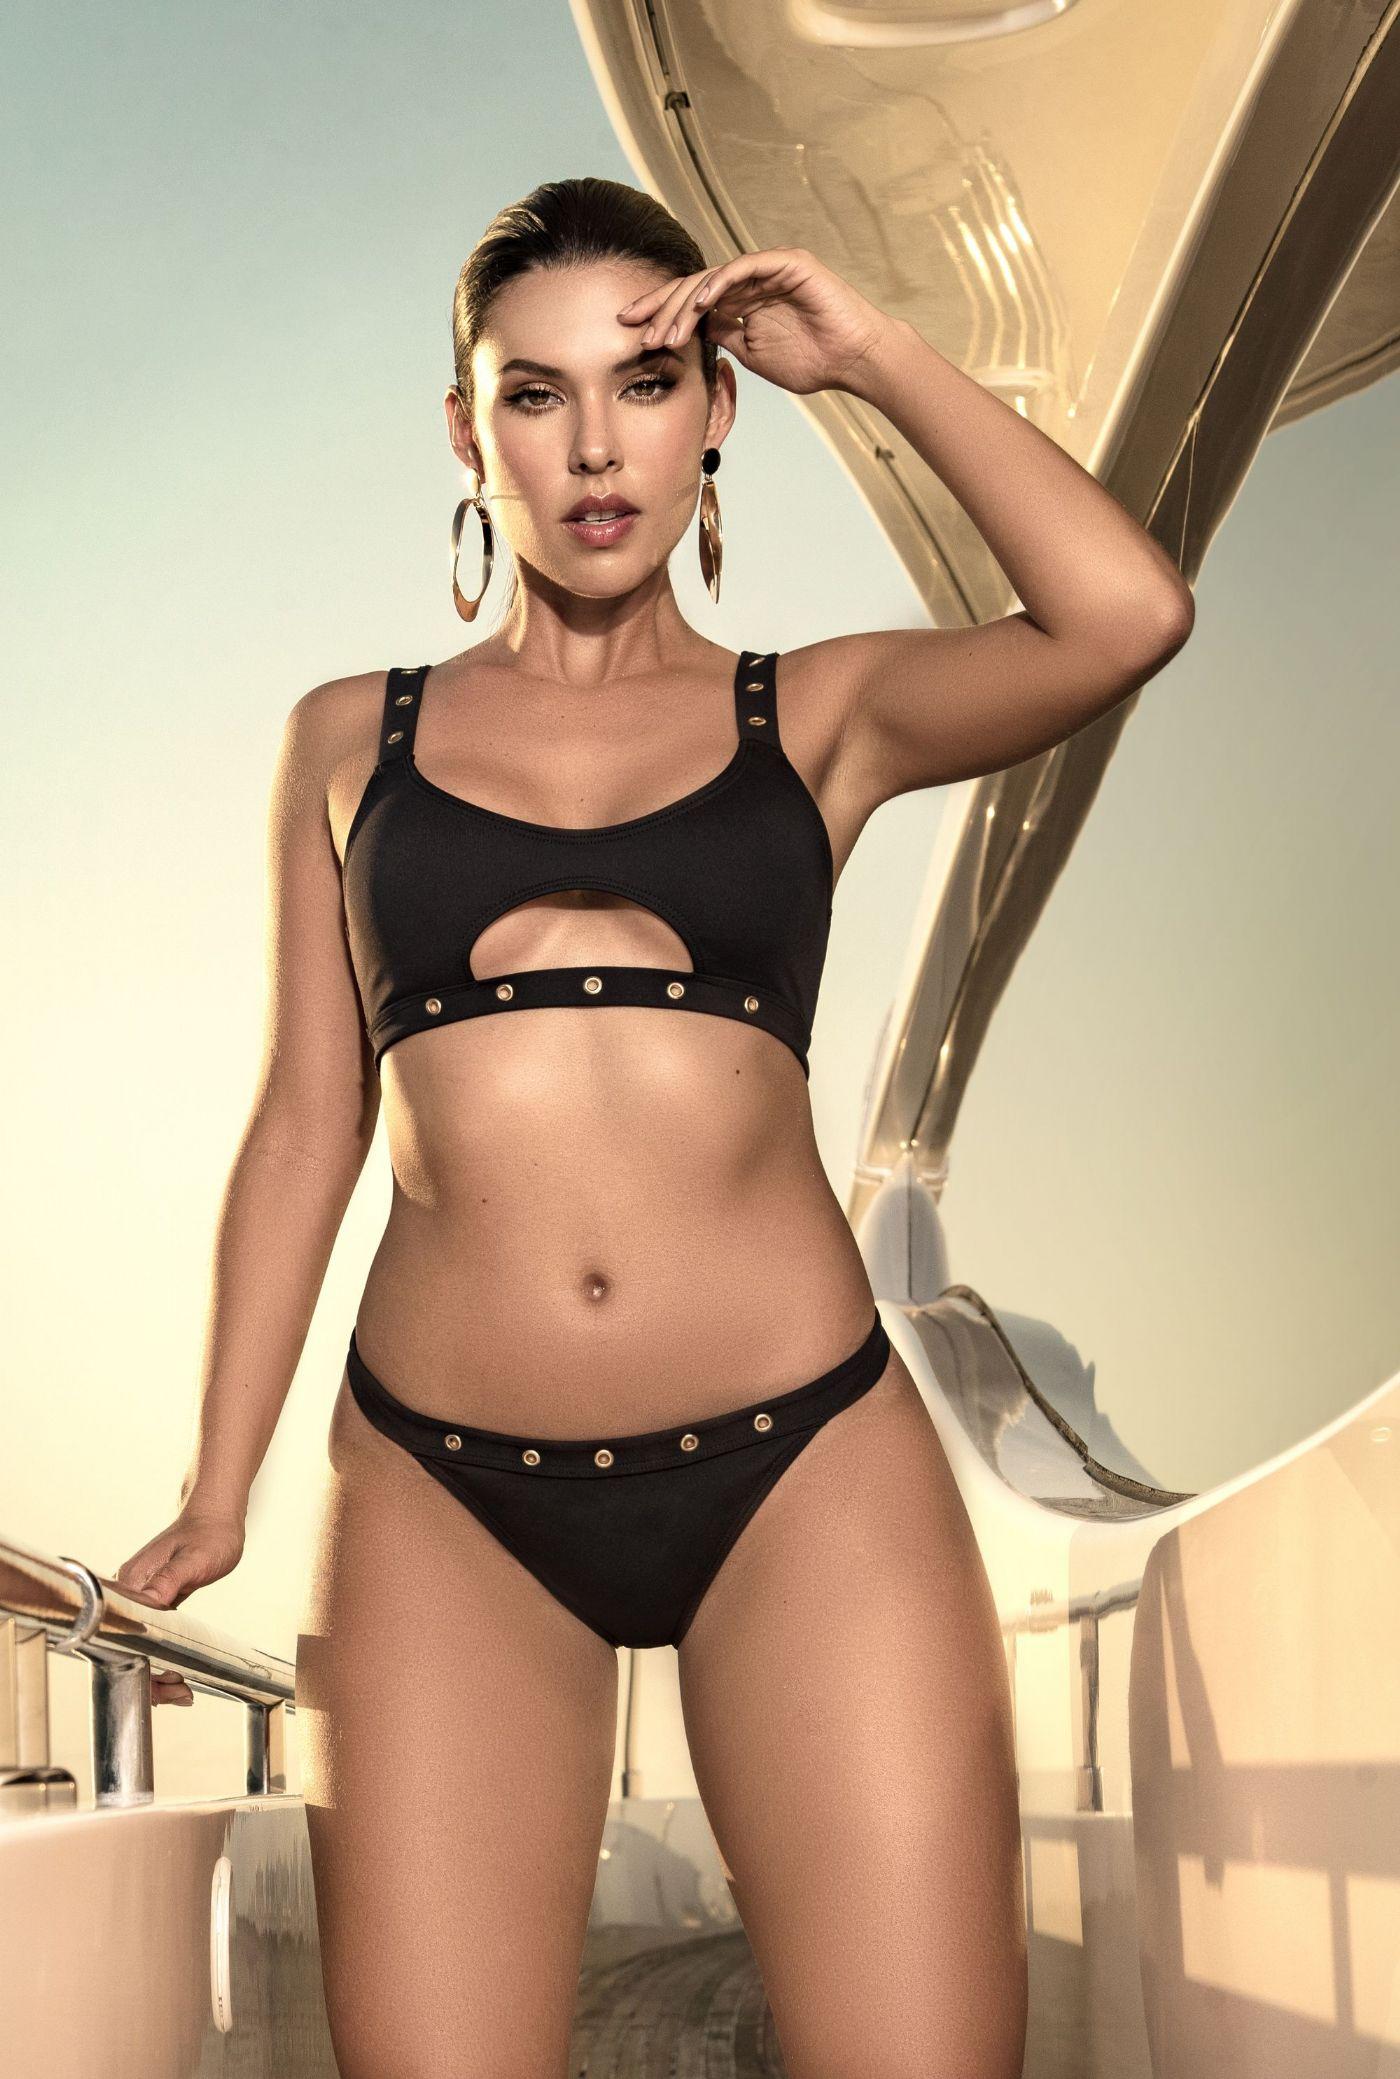 Bikini - Cutout top - Metal Eyelets (MAP6531)